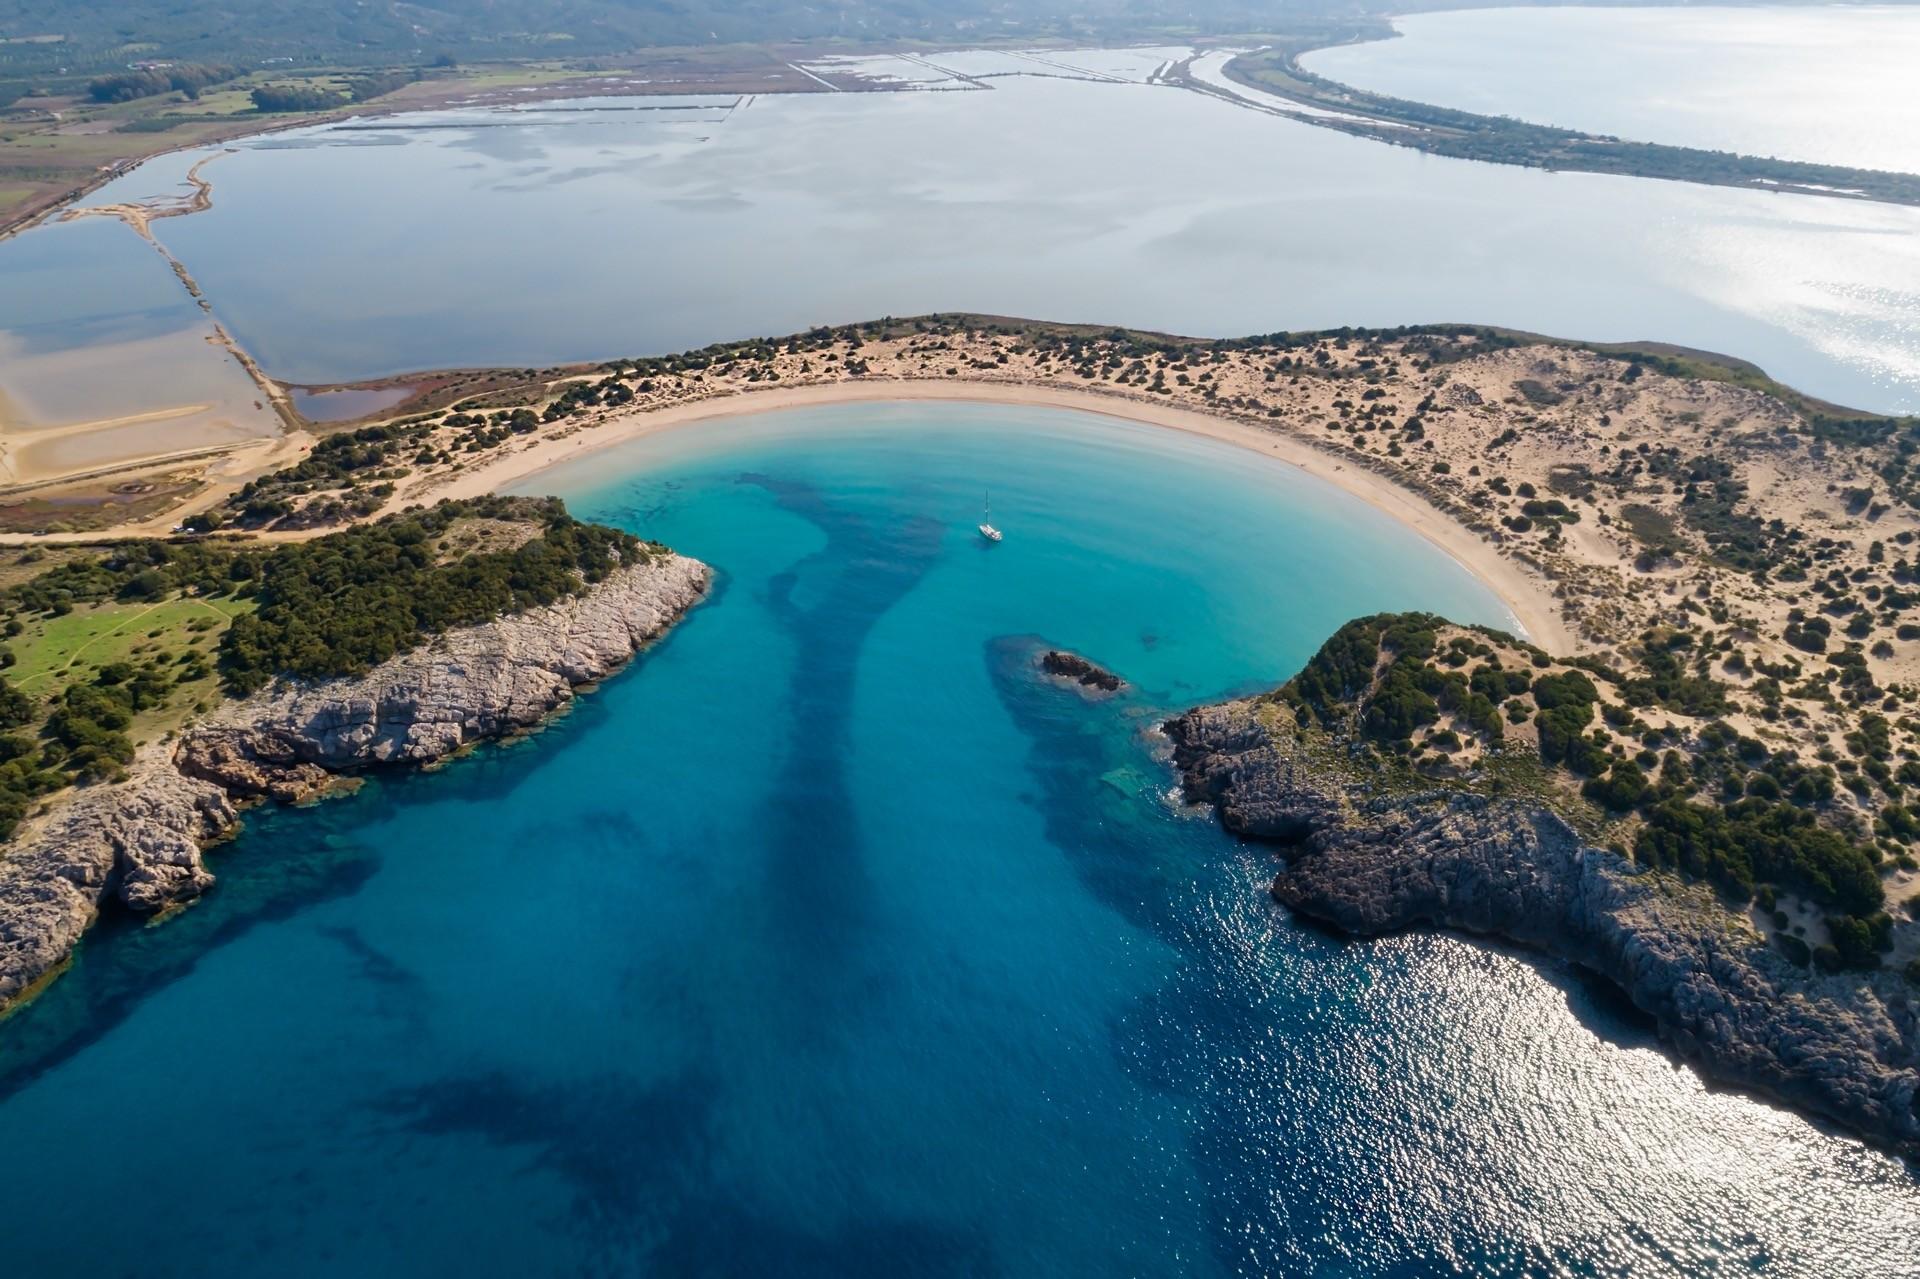 Voidokiliabucht, Peloponnes